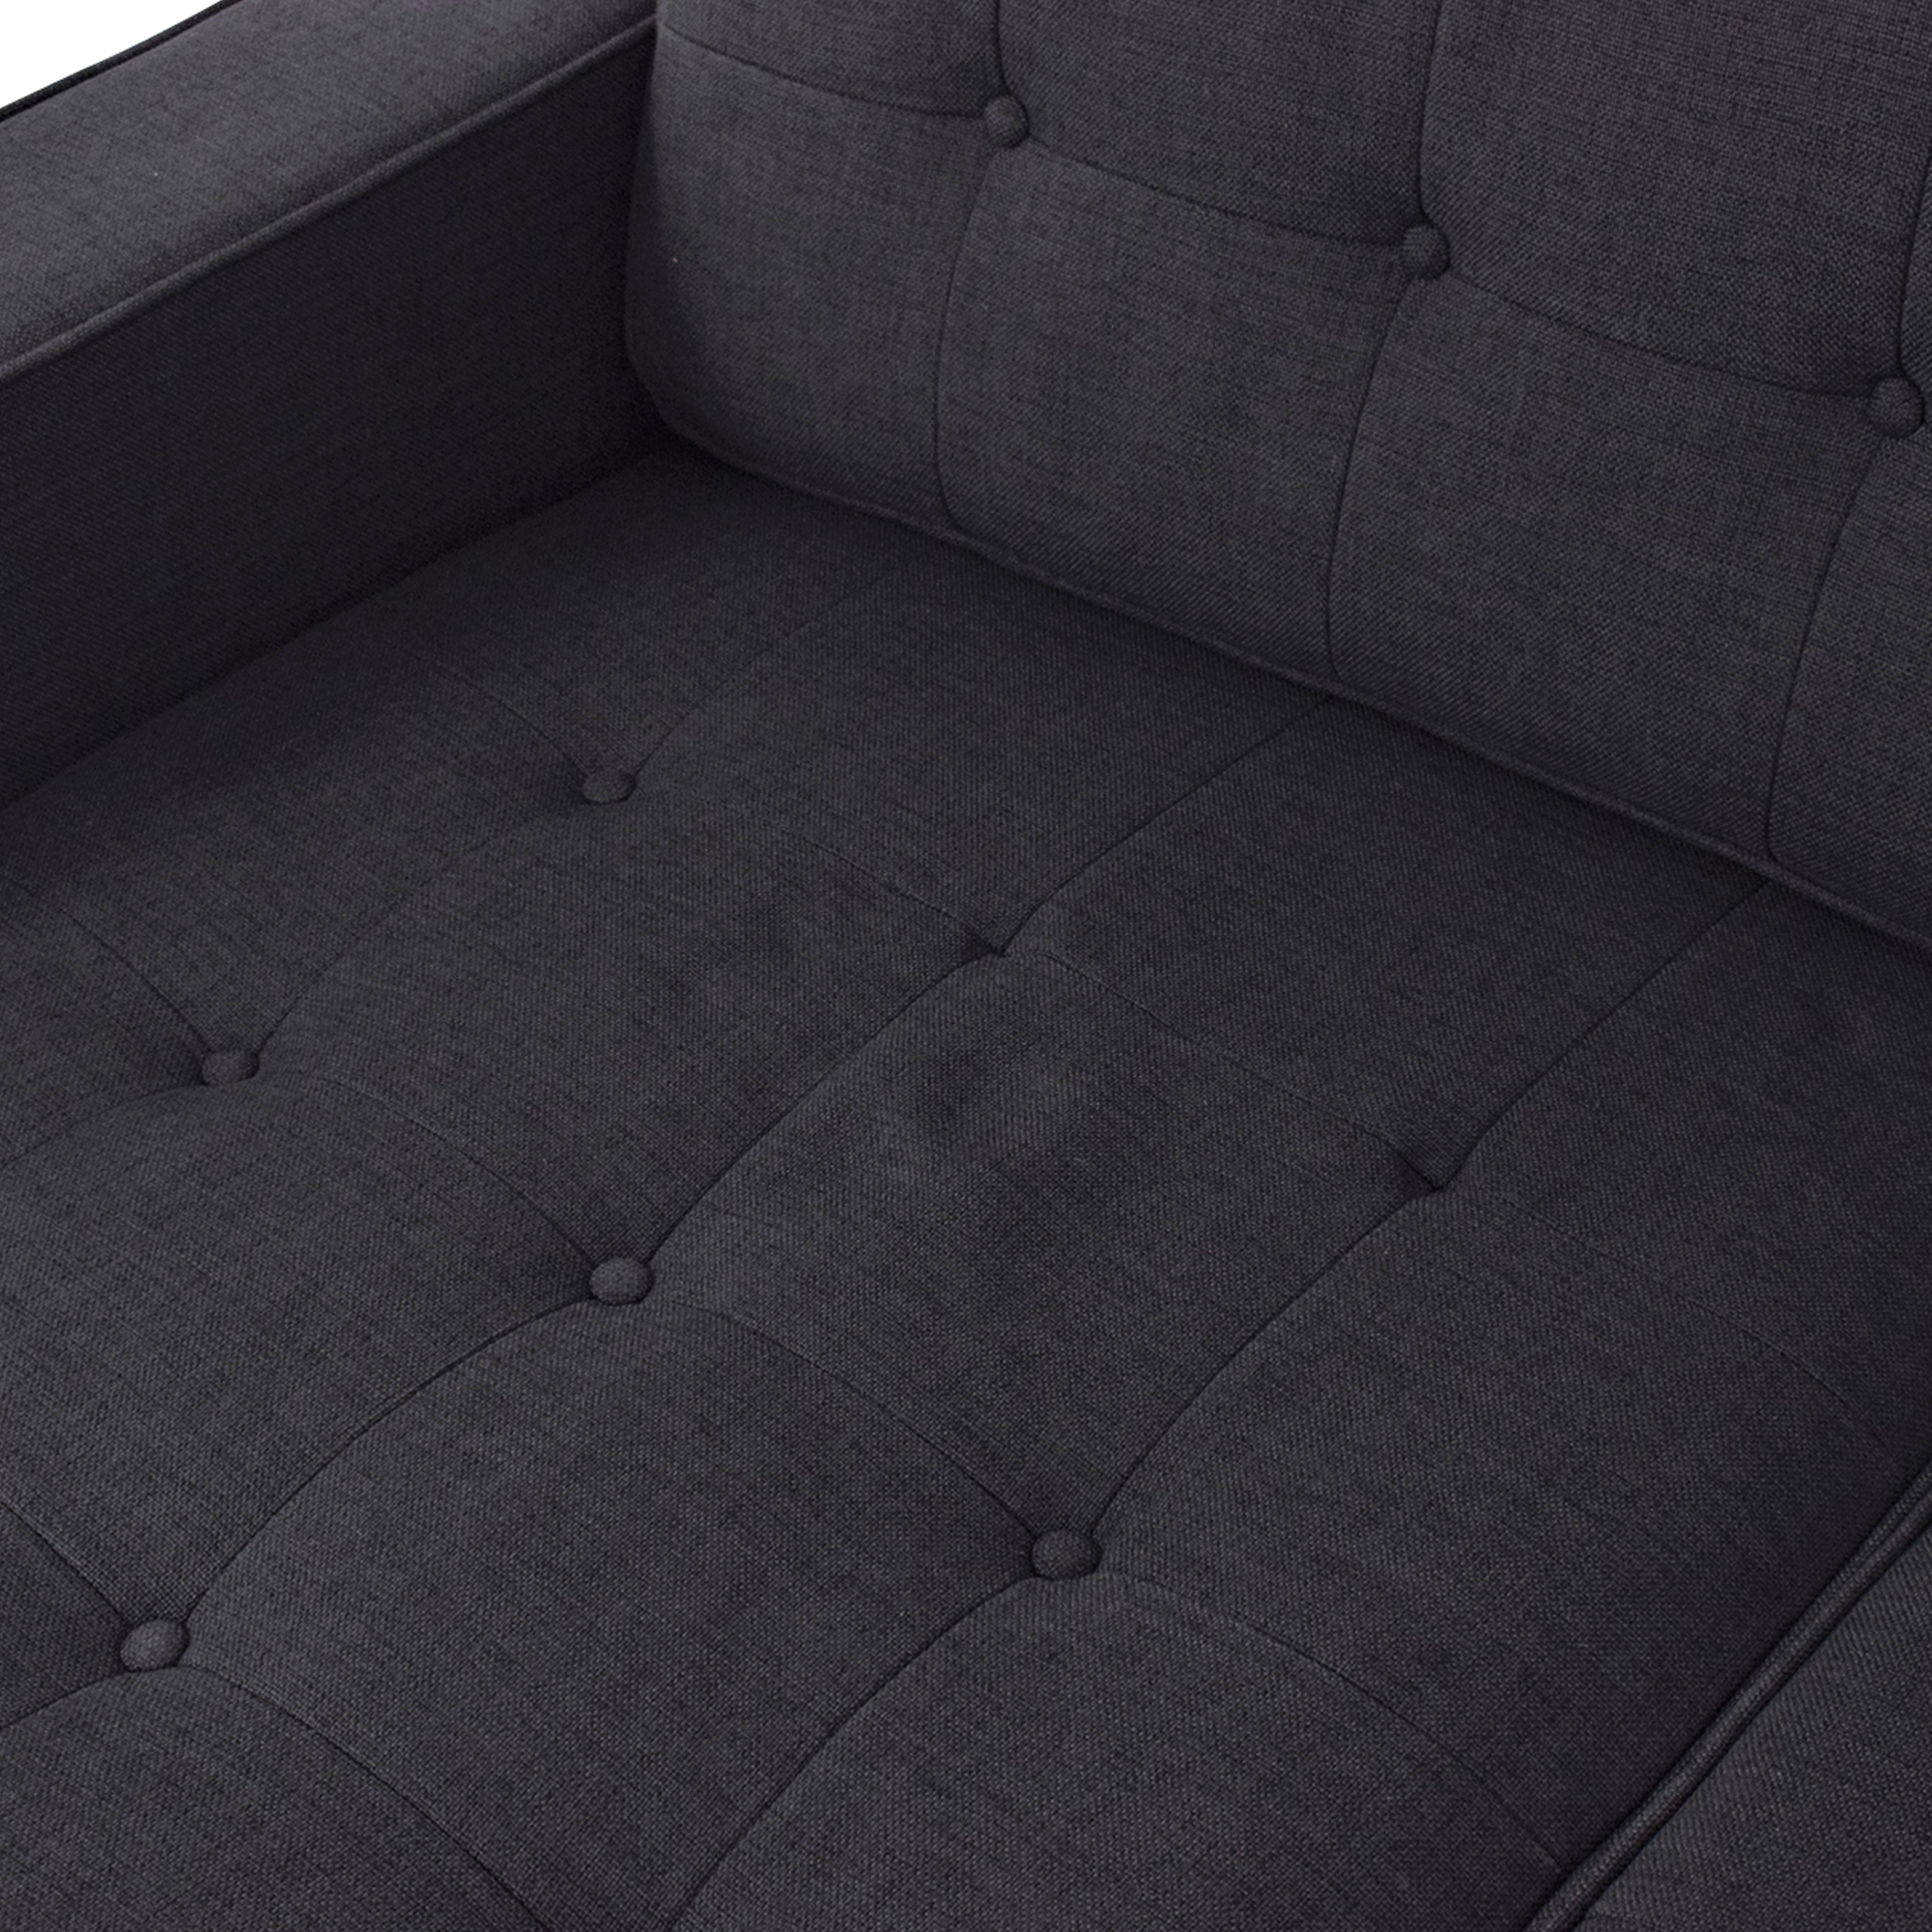 Gus Modern Gus Modern Jane Bi-Sectional Sofa